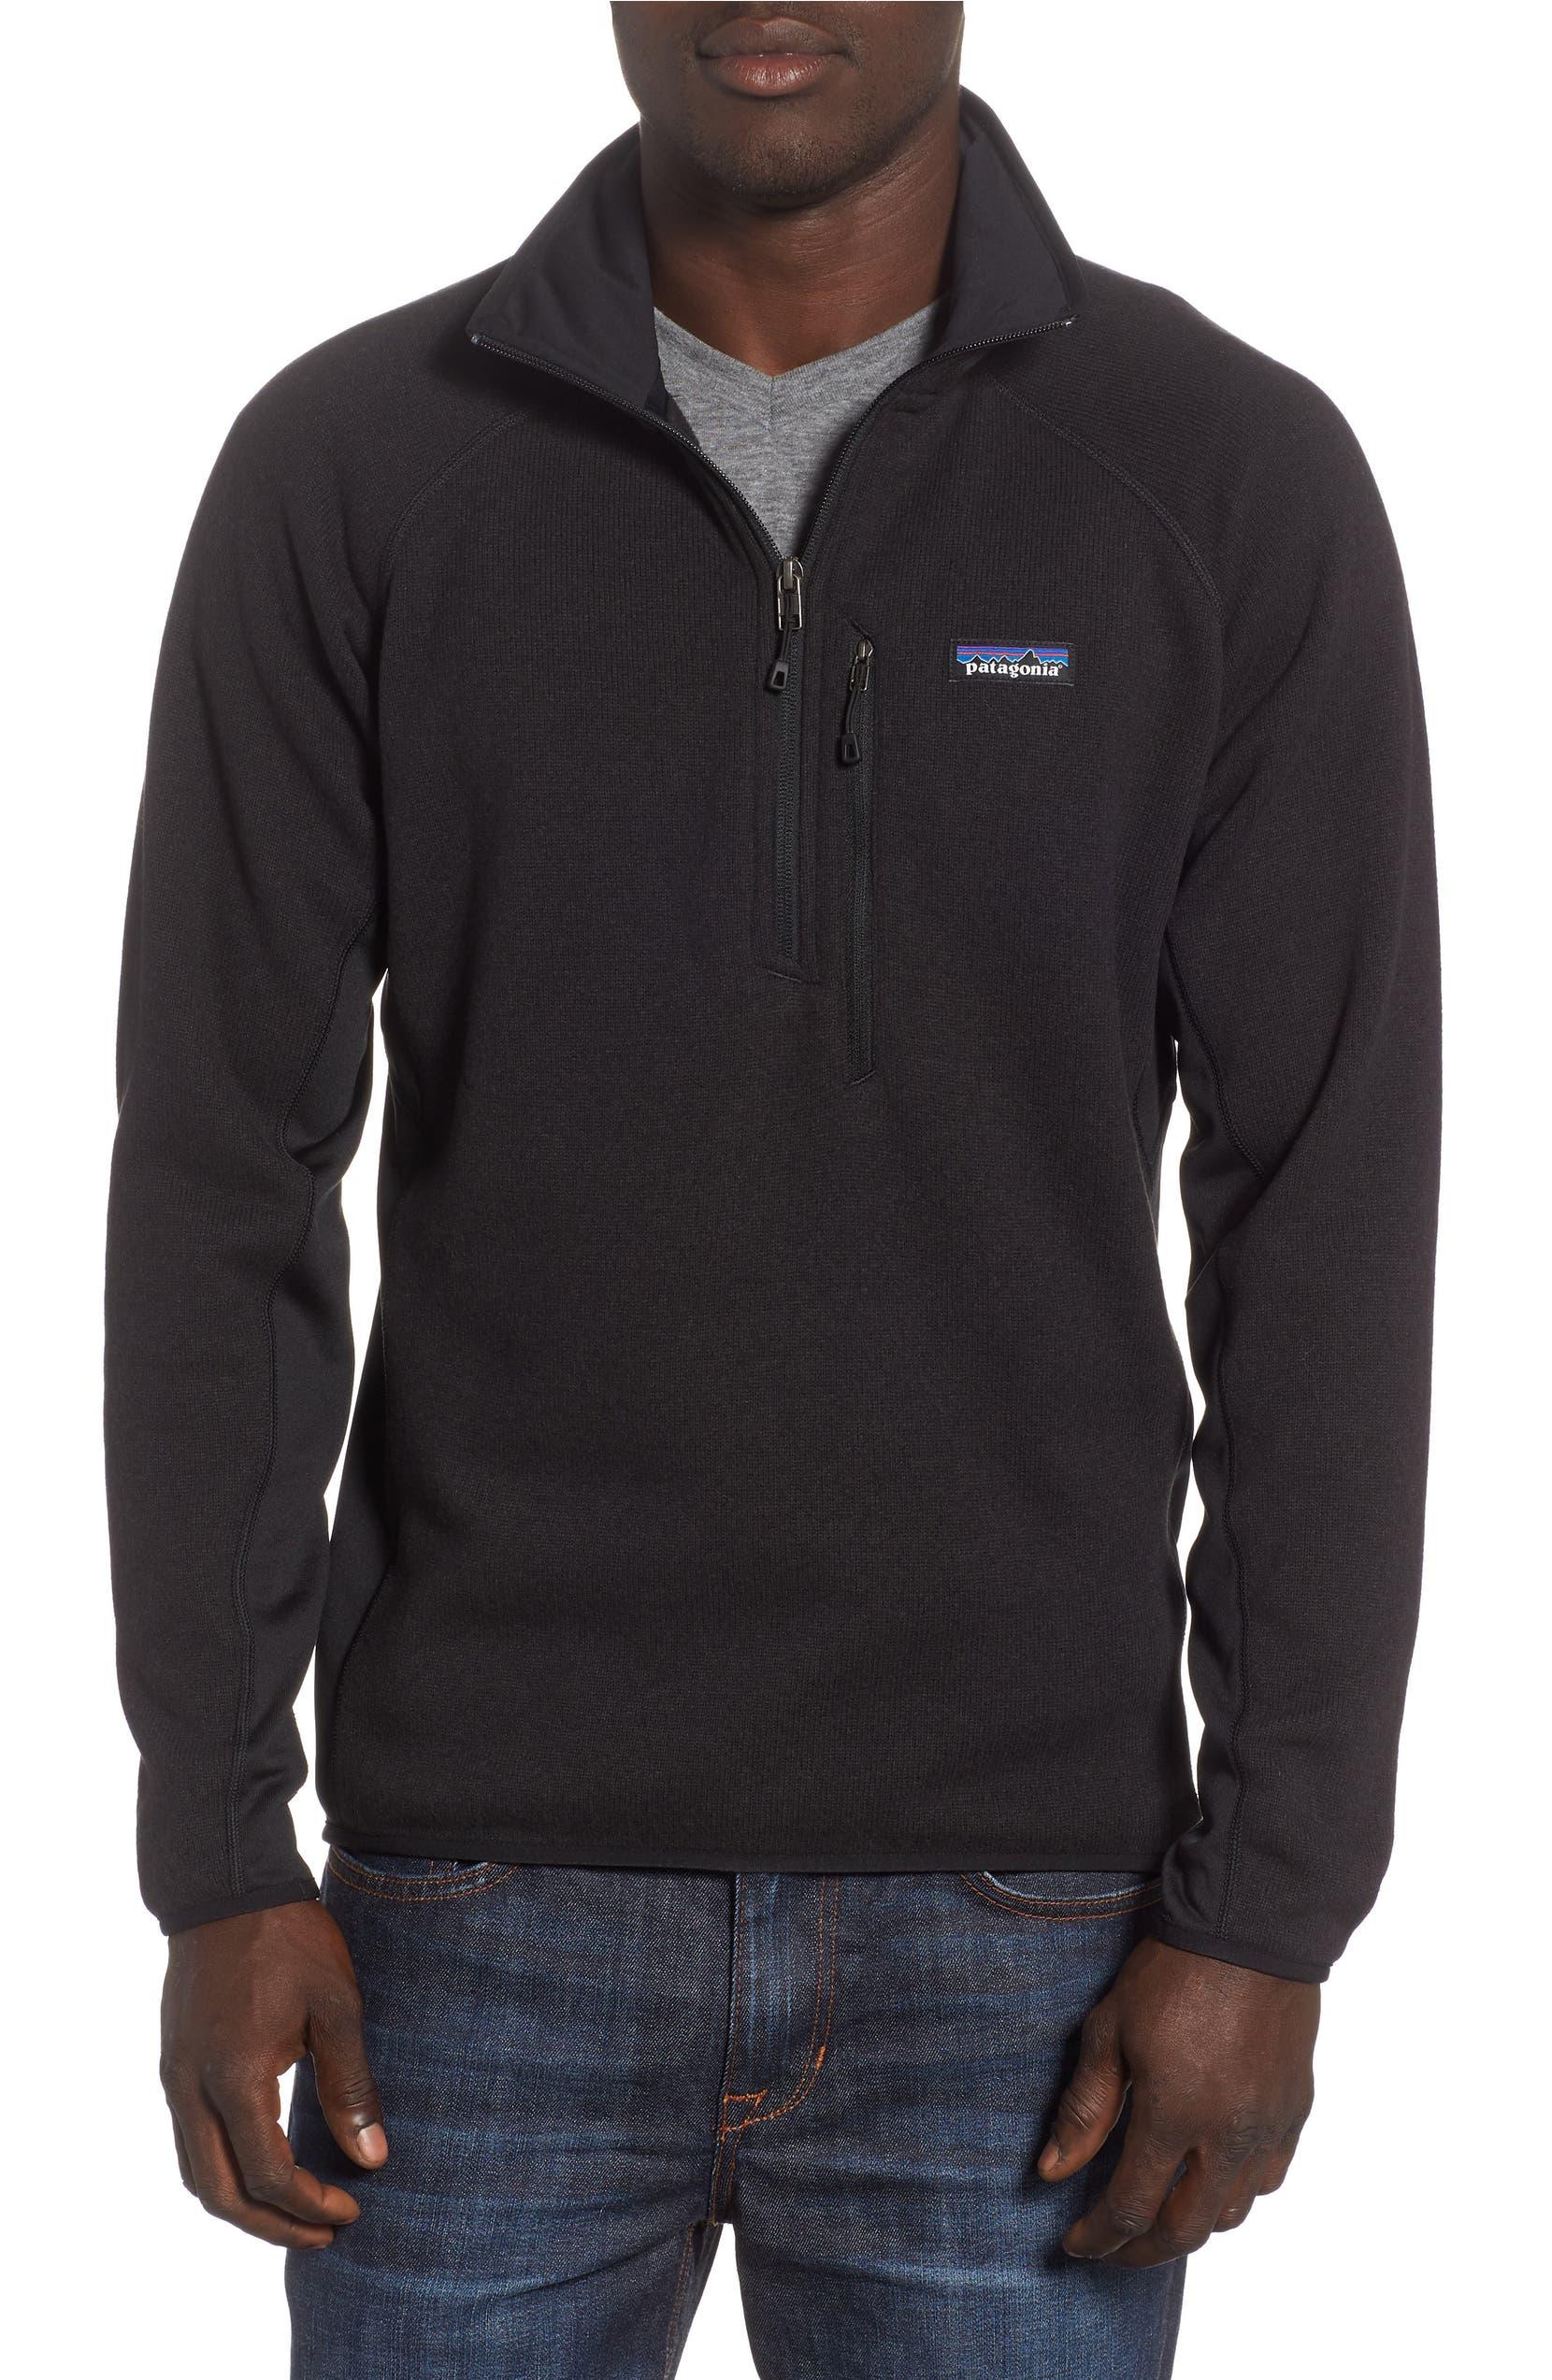 Better Sweater® Performance Slim Quarter-Zip Pullover